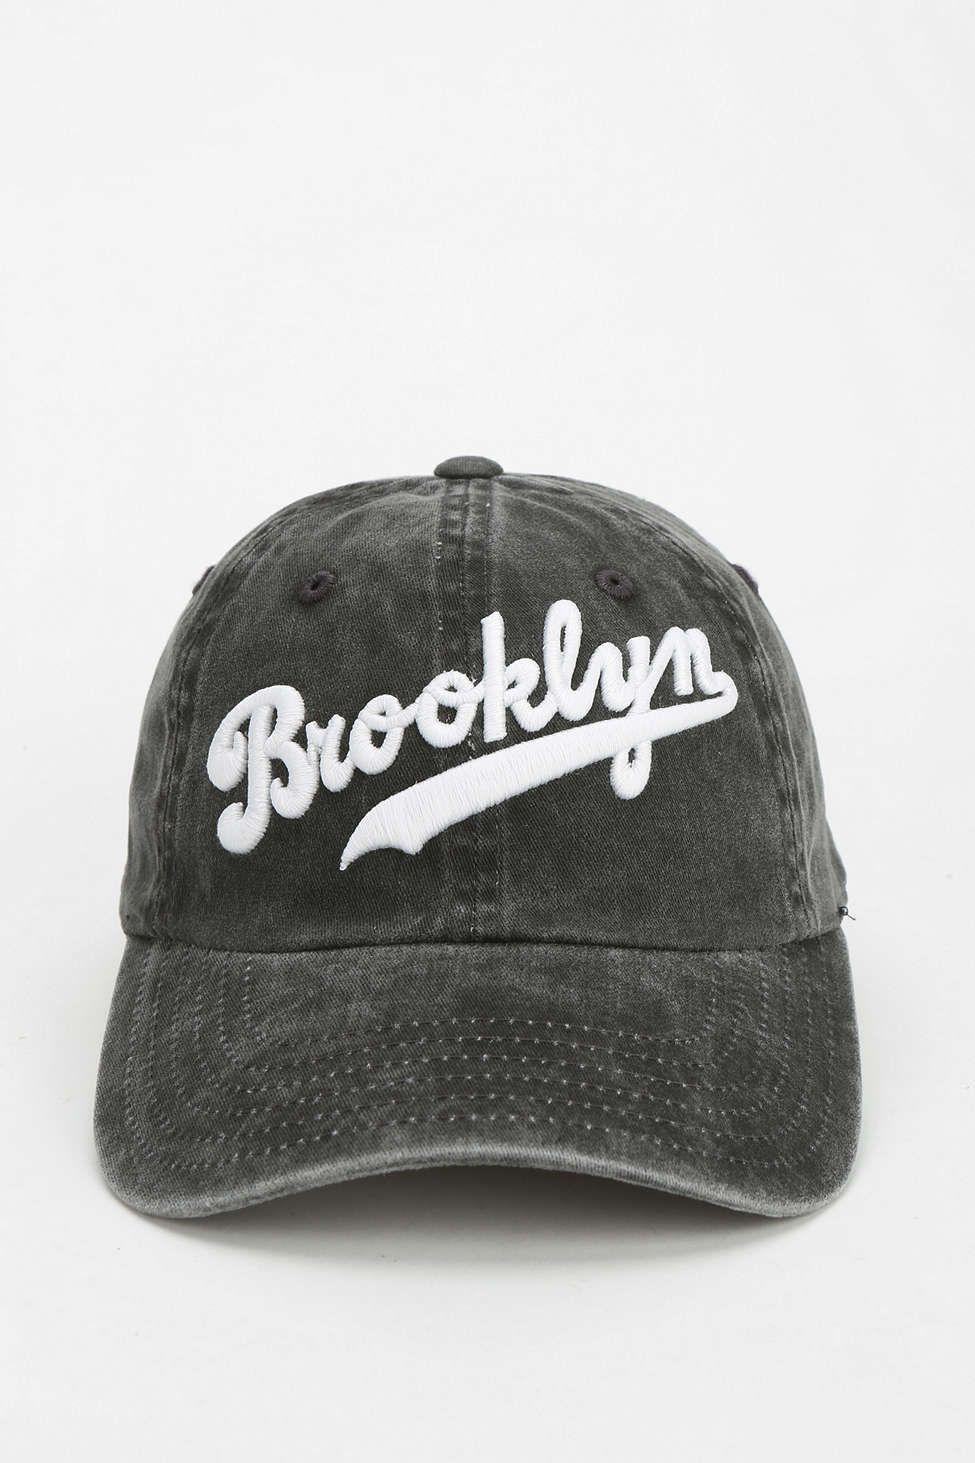 MLB Baseball Hat